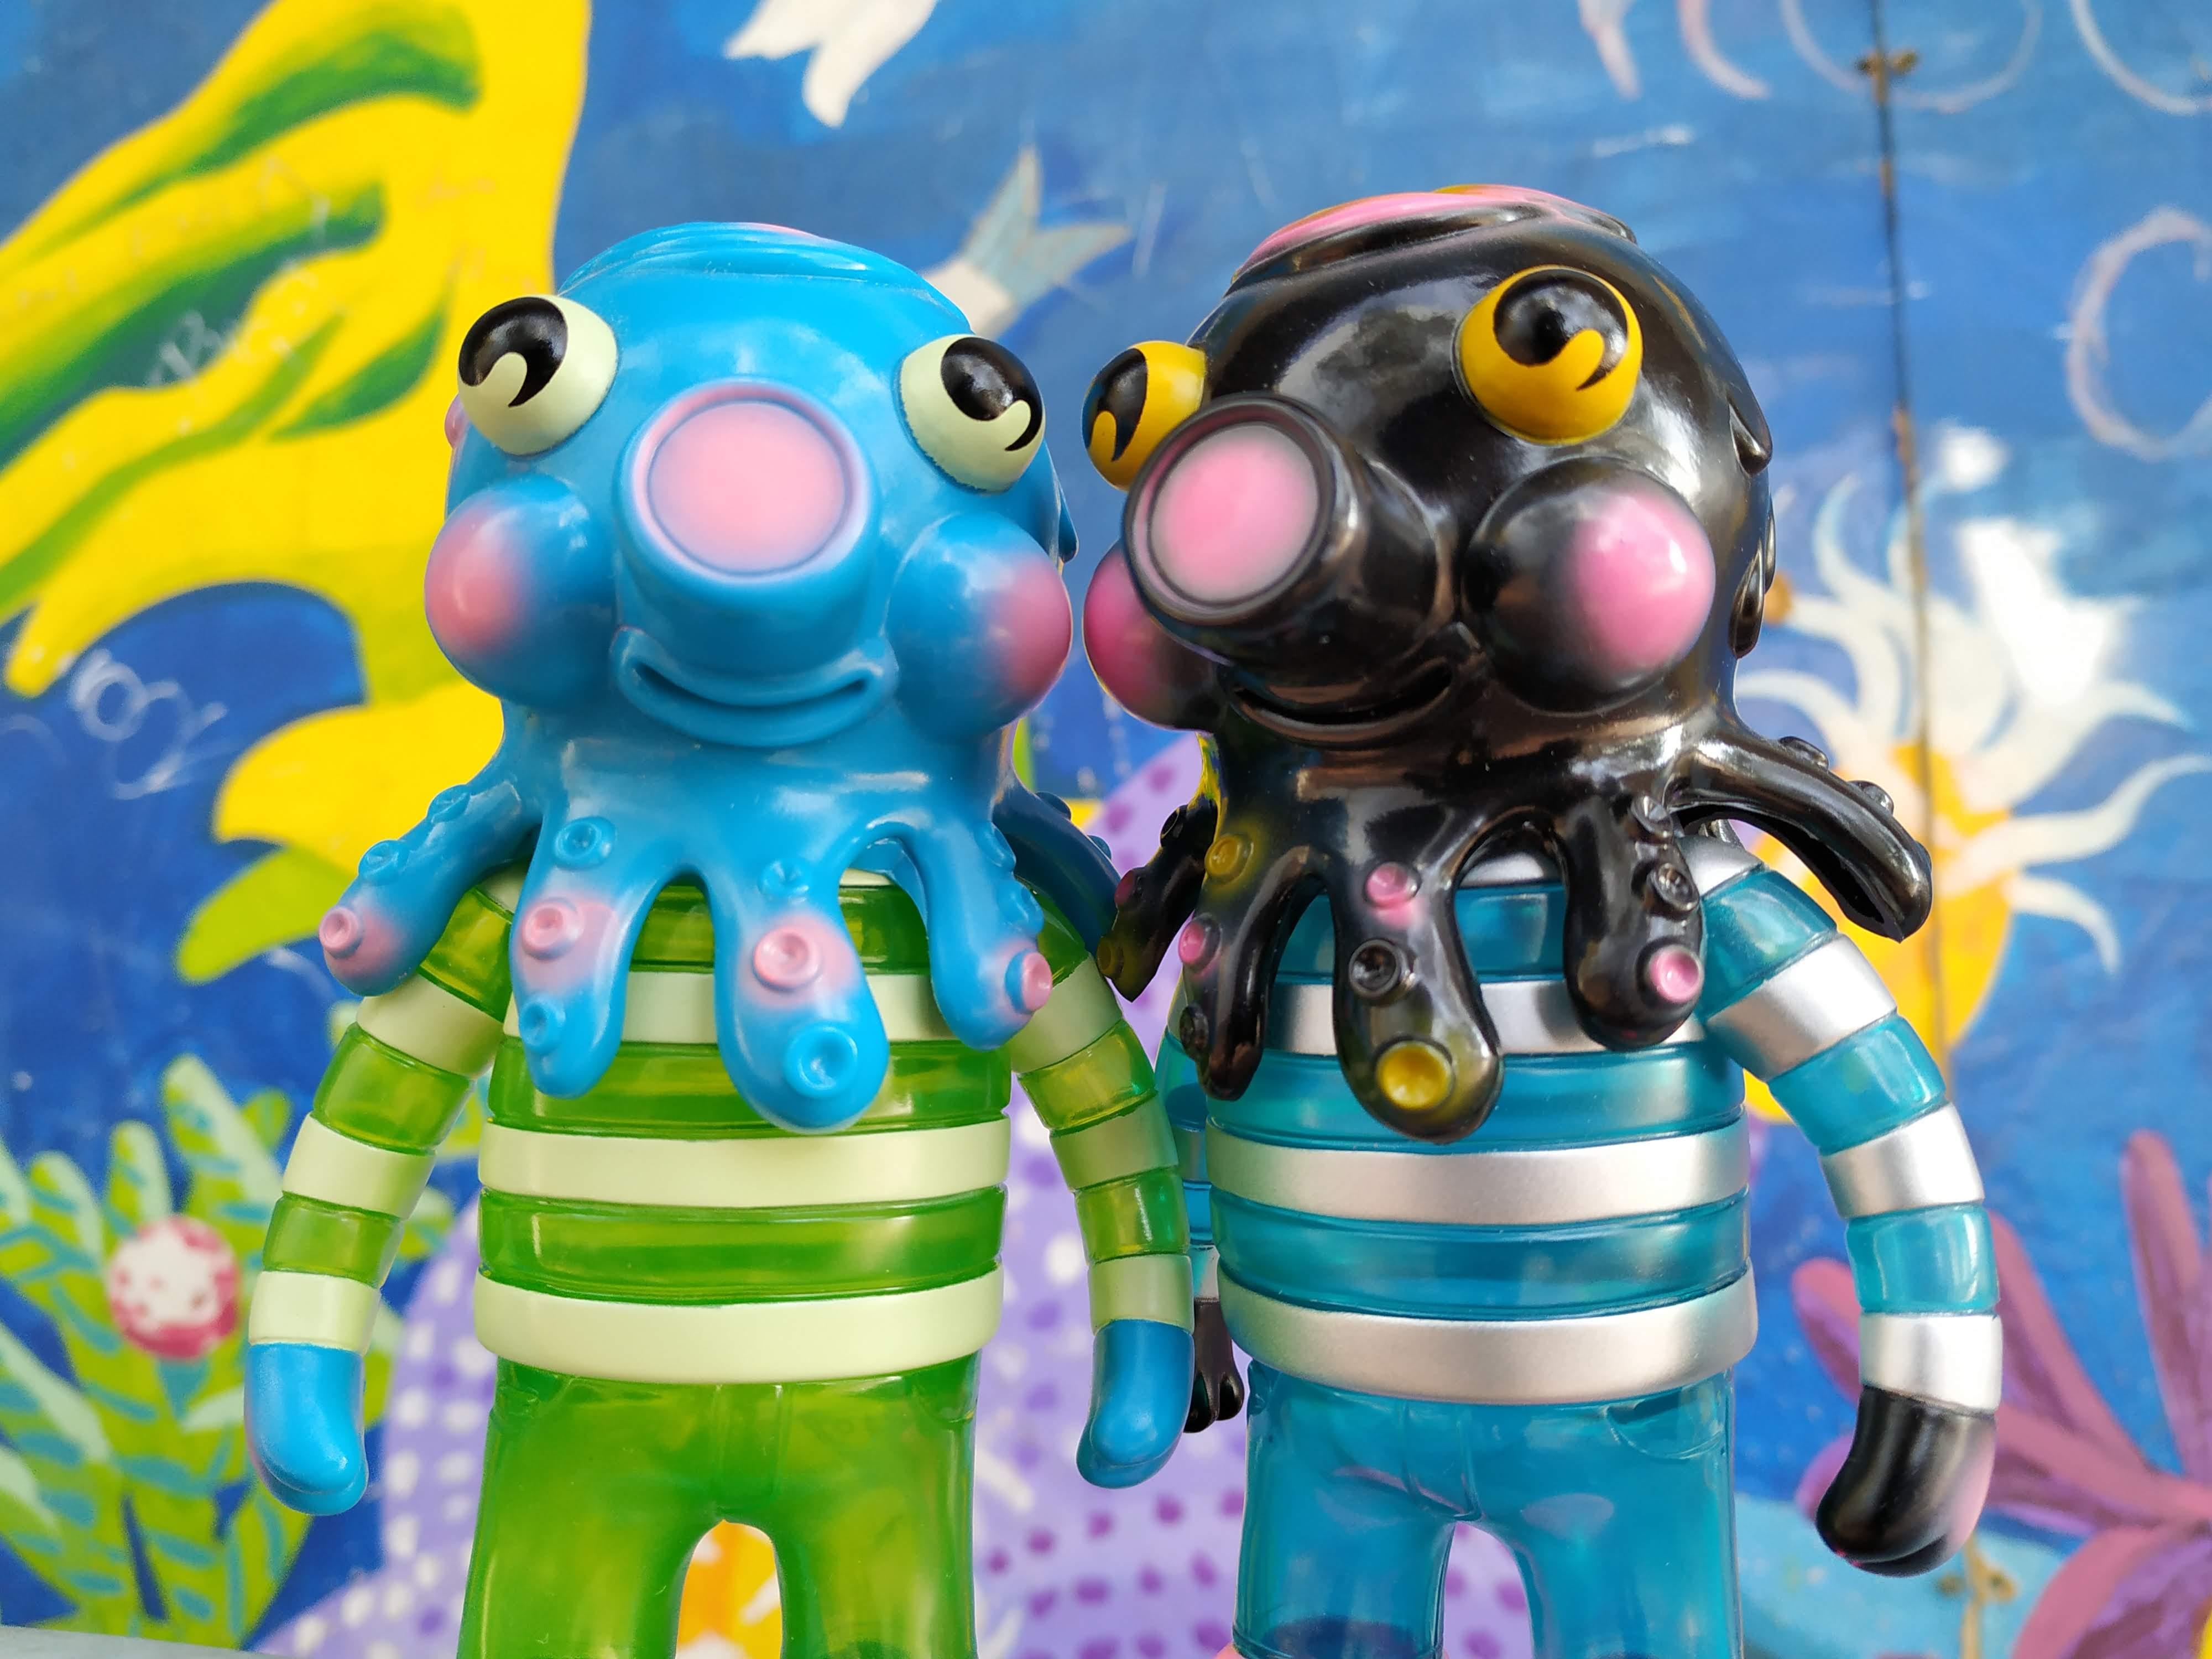 Big Brother Globby y Crystal Powers Rainy Day Globby de Bwana Spoons Art Toy Sofubi